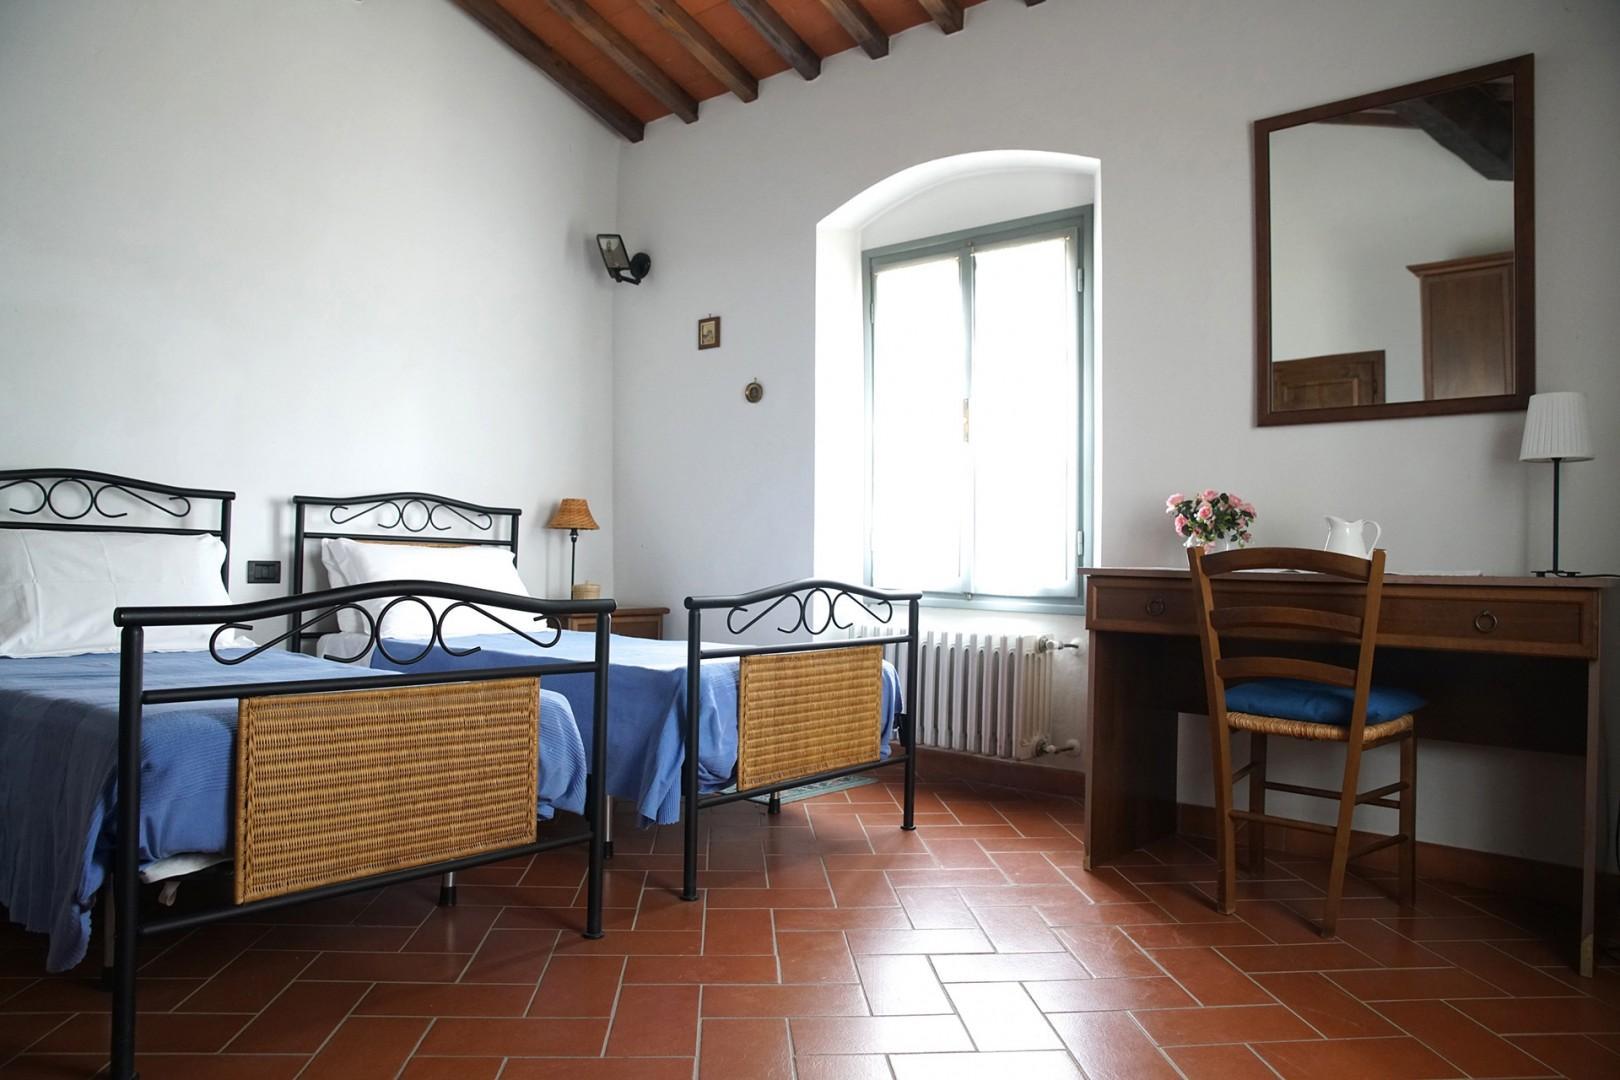 Bedroom 2 has two beds with and en suite bathroom.